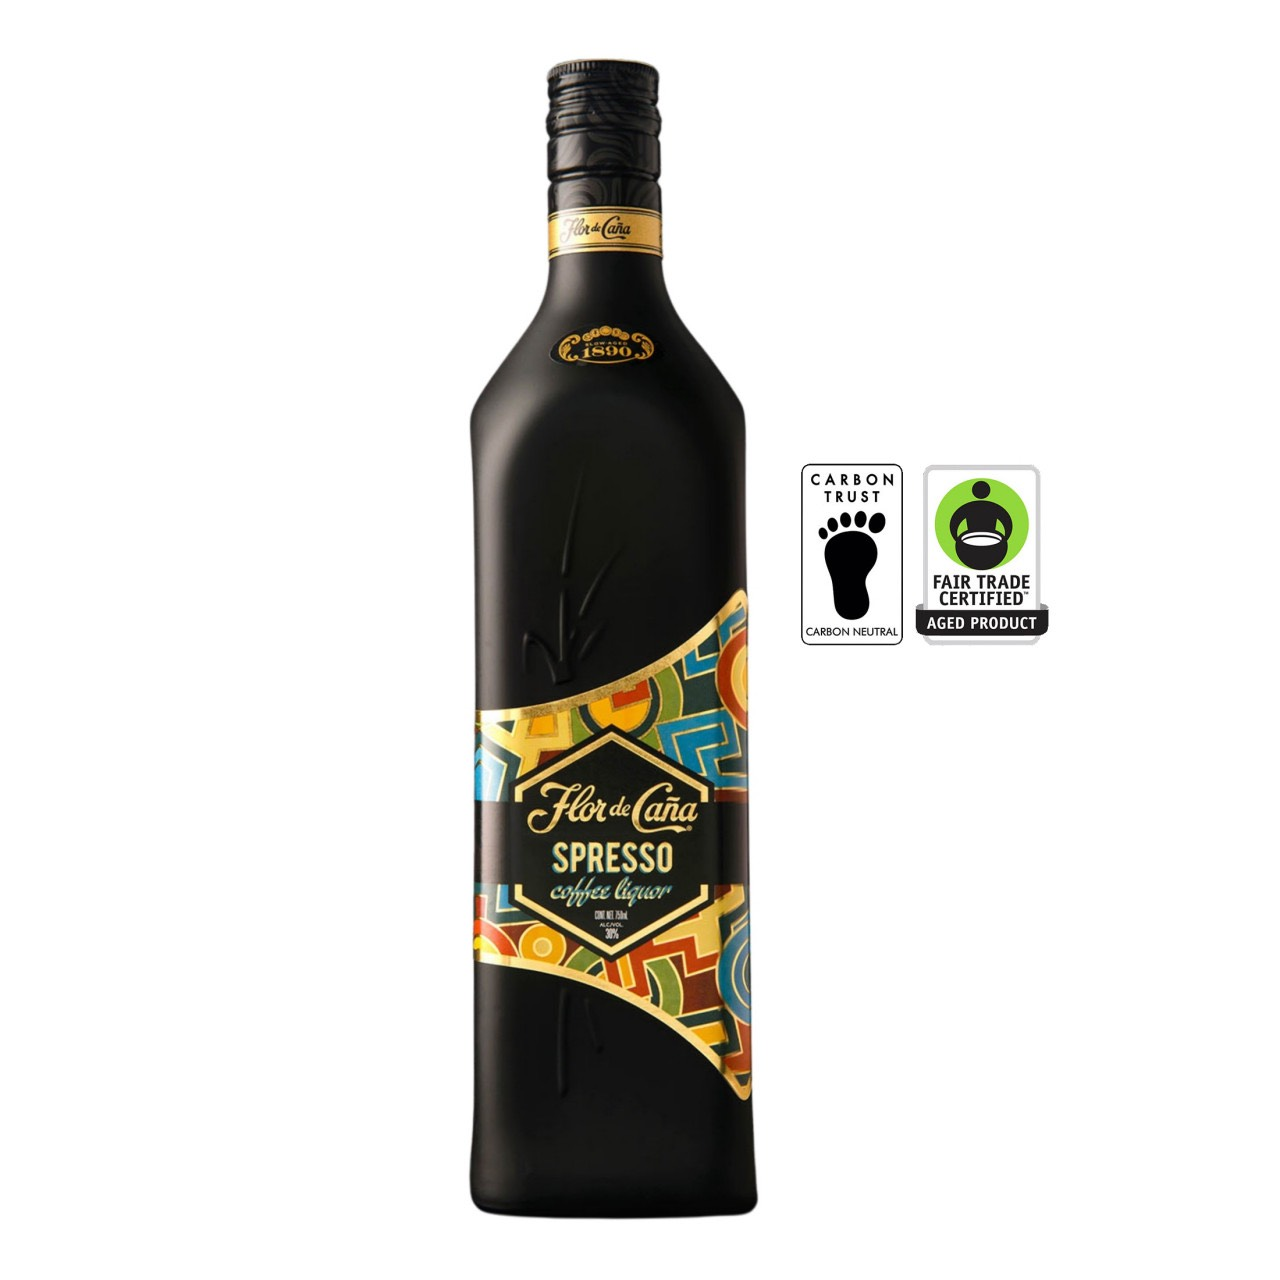 Bottle image of Flor de Caña Spresso